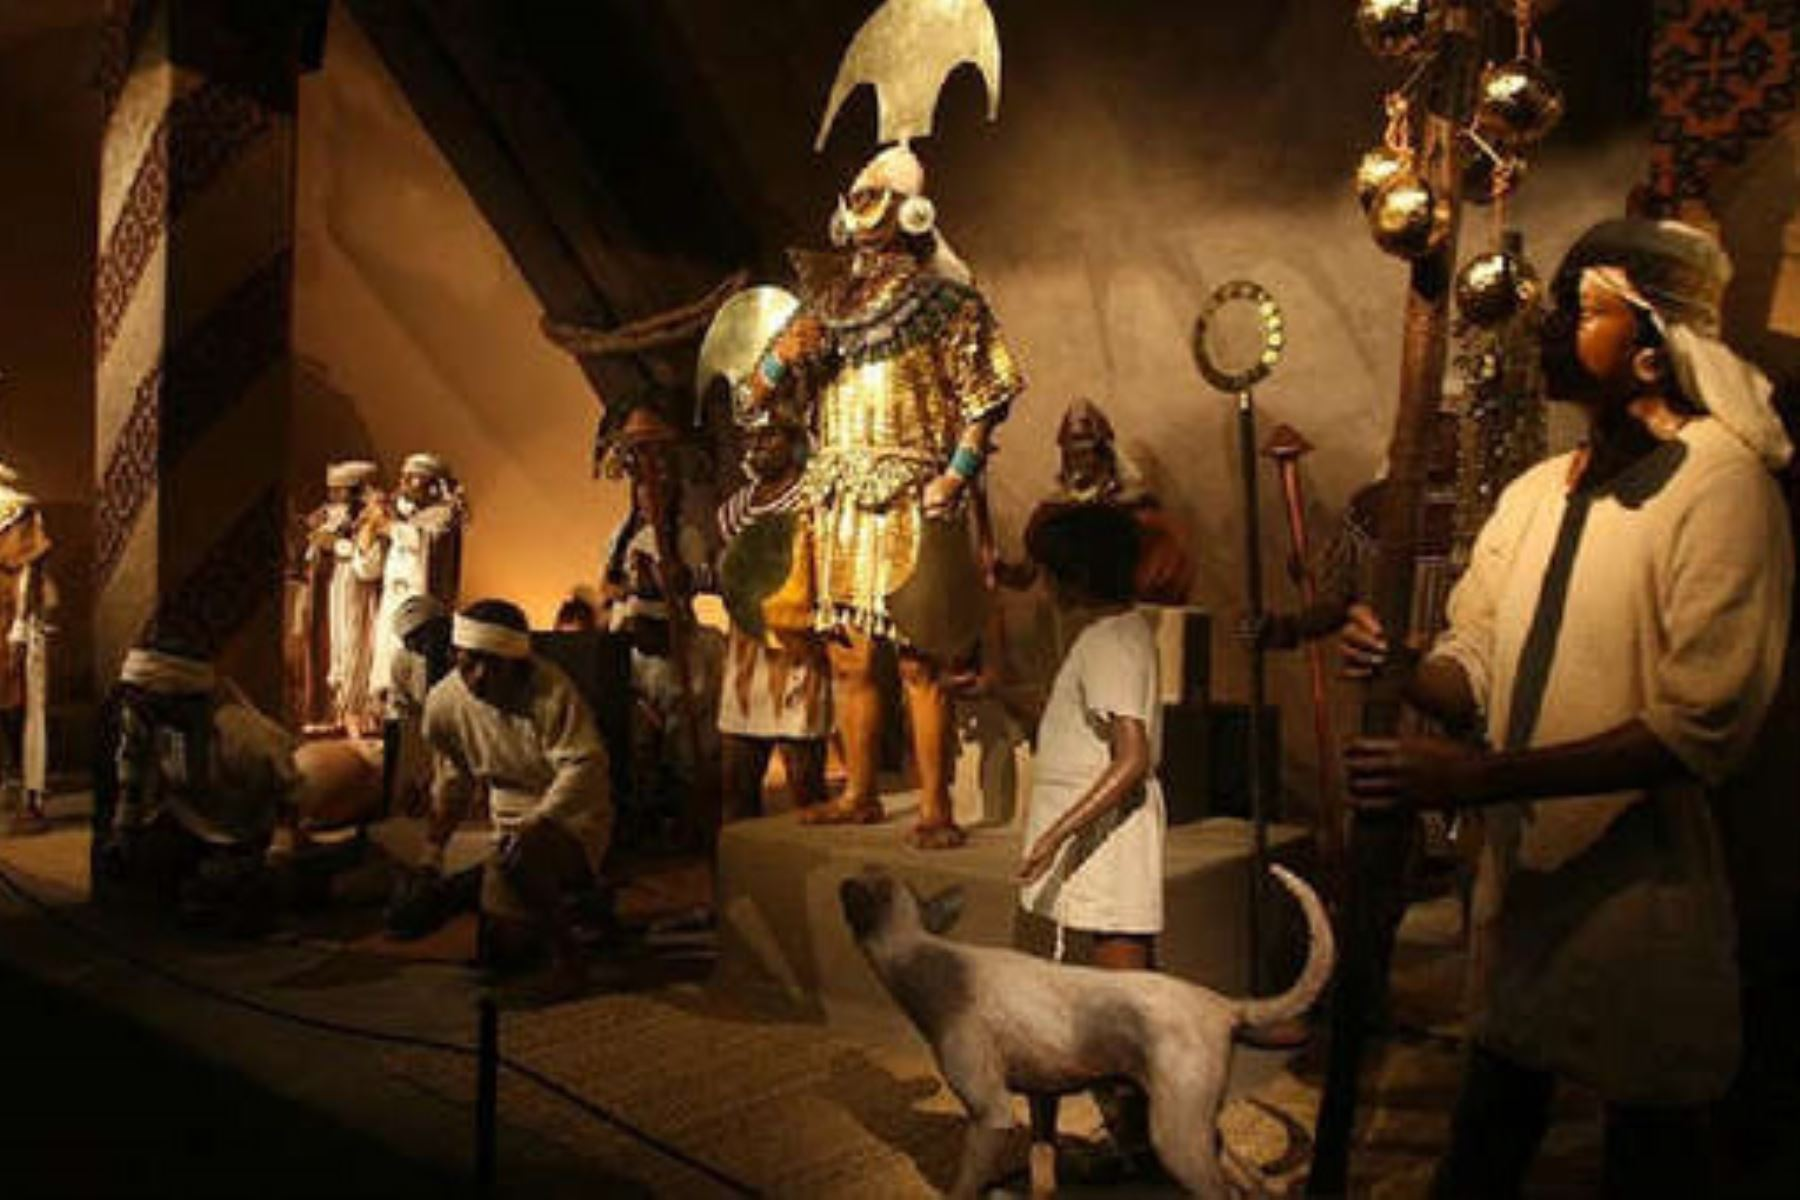 Réplica del Señor de Sipán se presentará en Feria Internacional de Arequipa. ANDINA